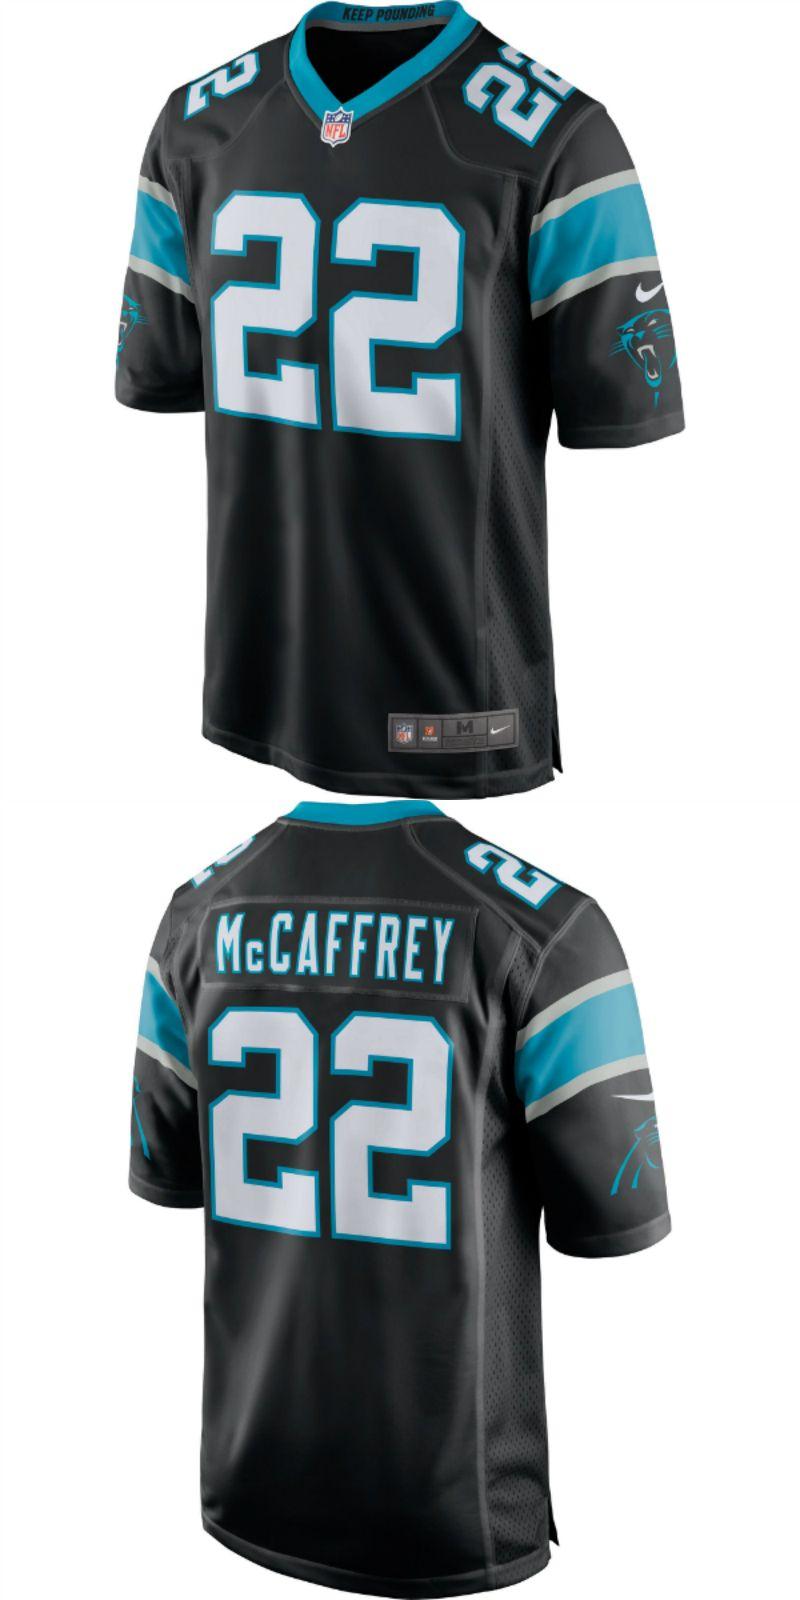 0bc87fc9 UP TO 70% OFF. Christian McCaffrey Carolina Panthers Nike Game ...